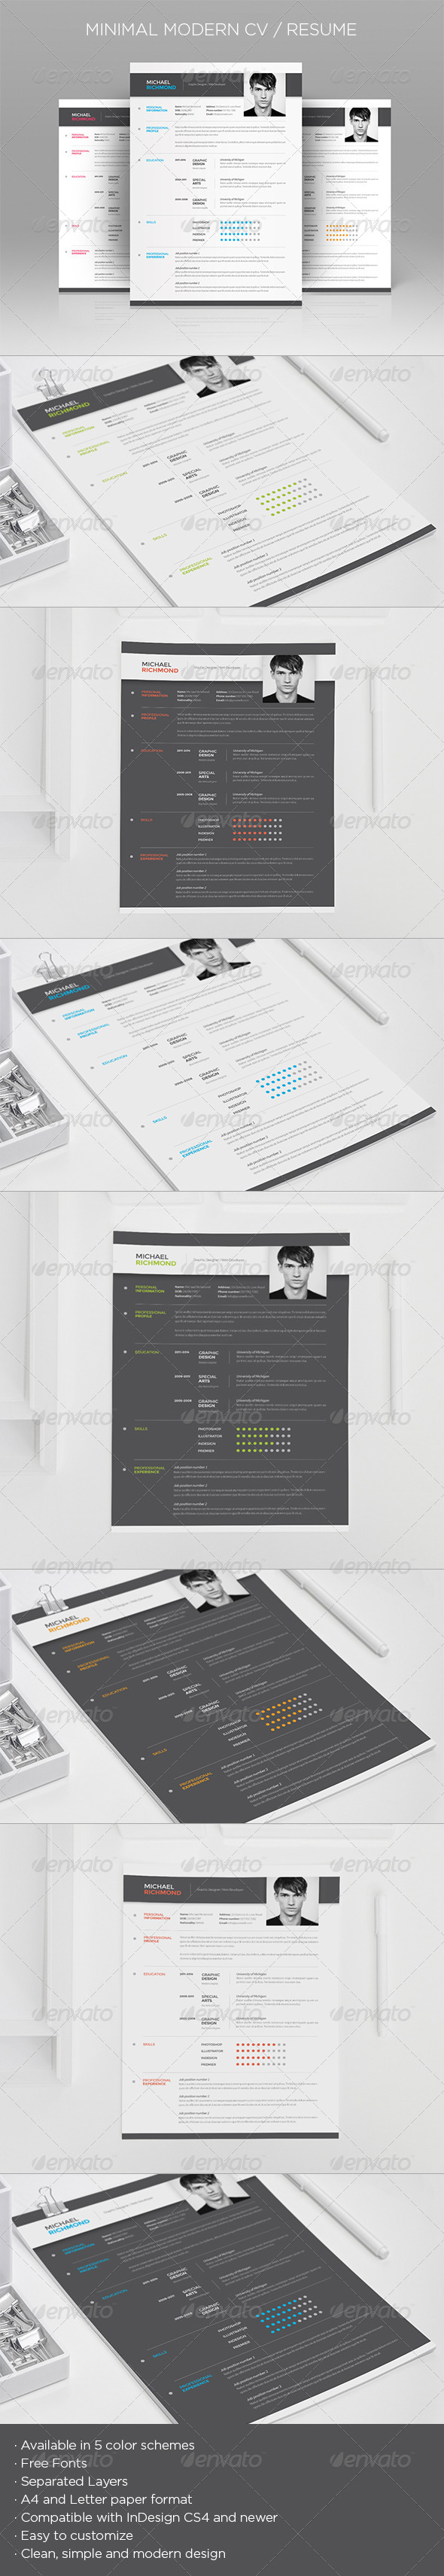 GraphicRiver Minimal Modern CV Resume 7207198